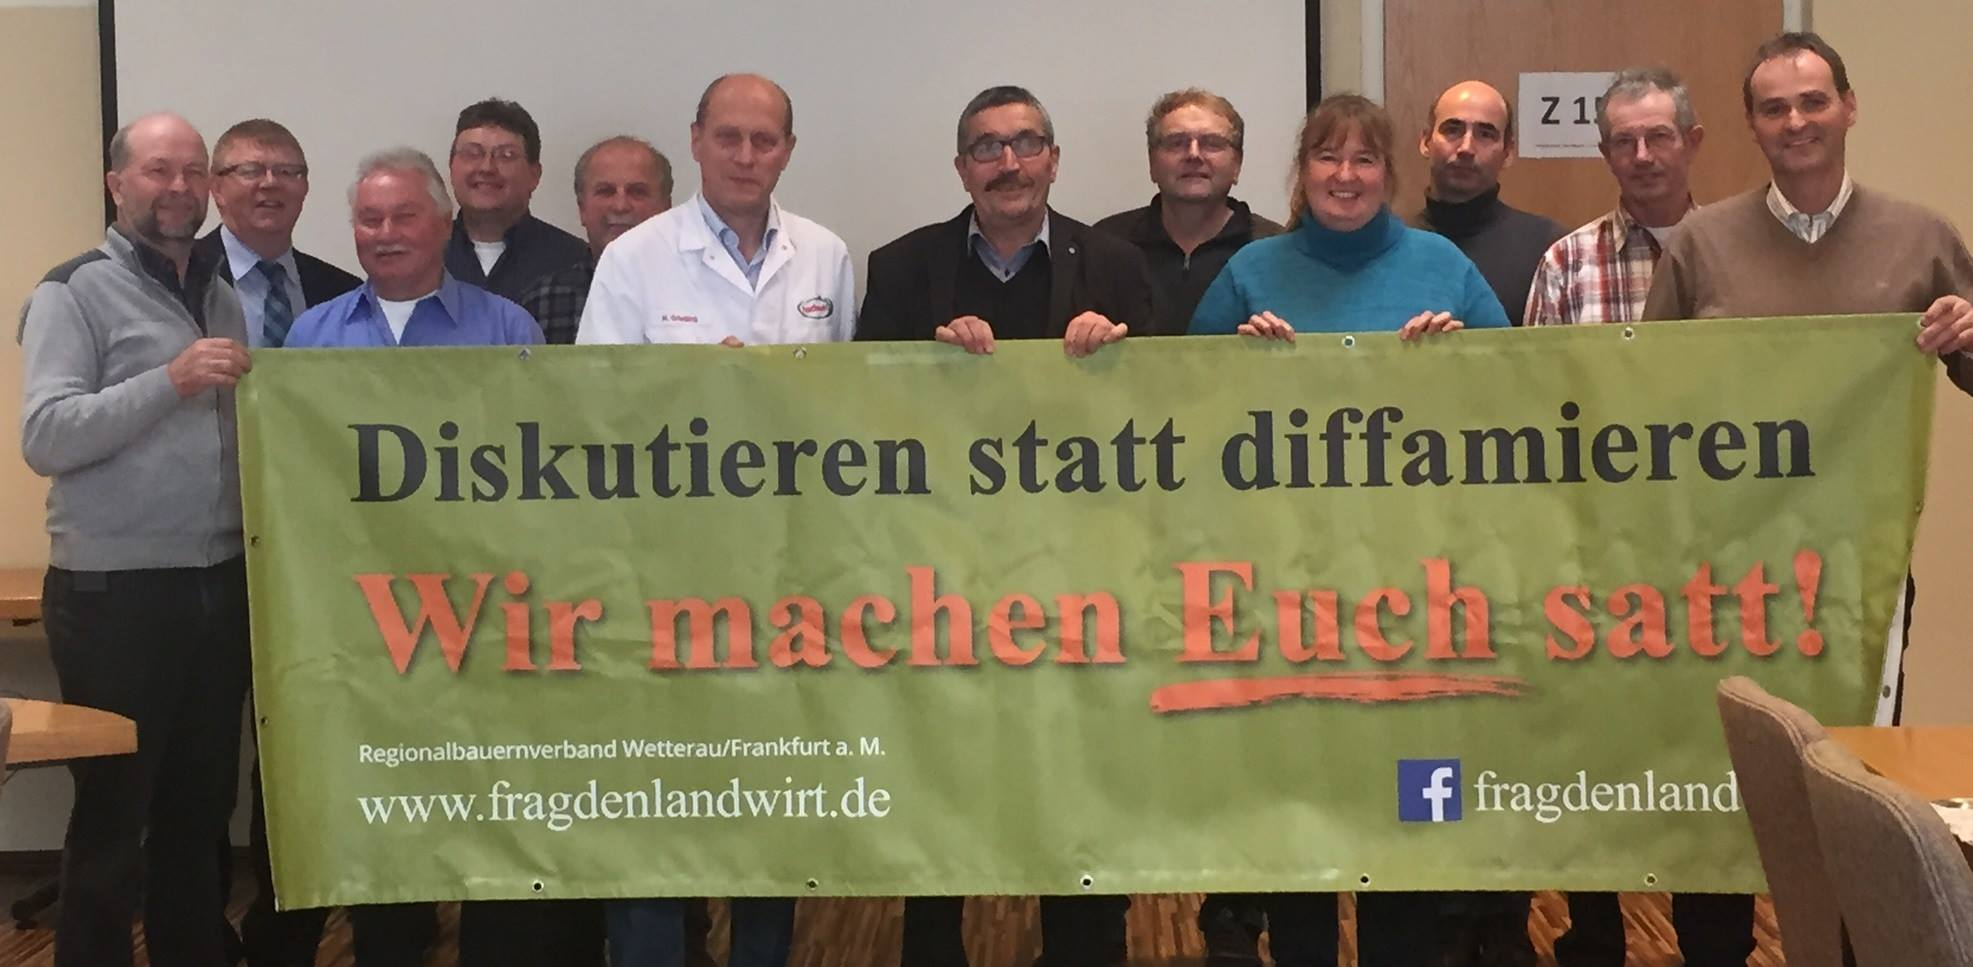 Regionalbauernverband Wetterau